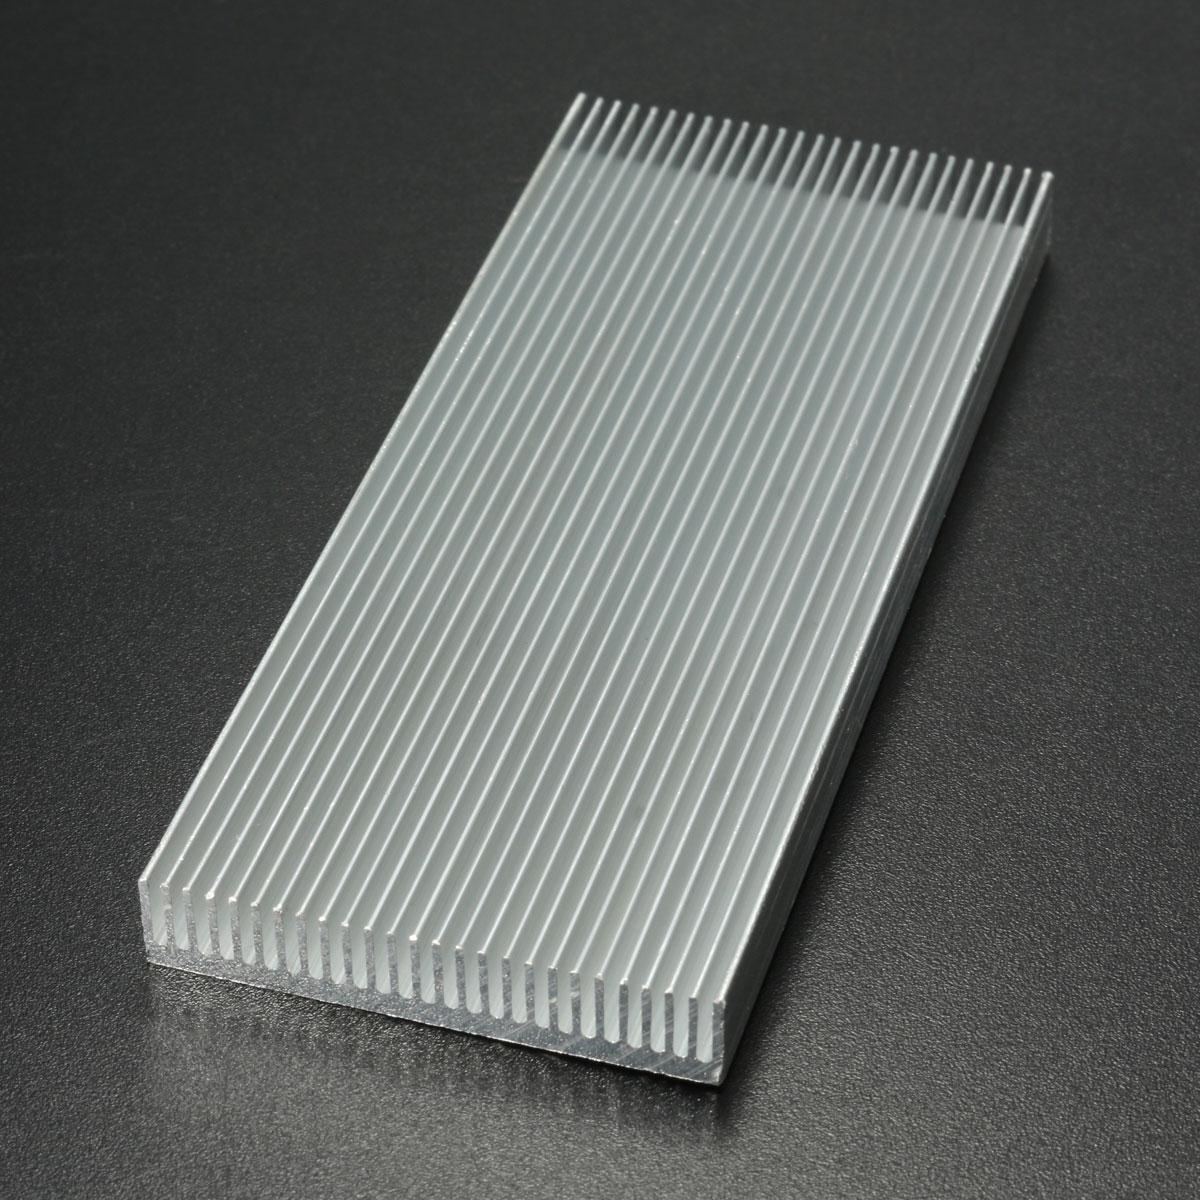 100x41x8mm aluminum heat sink heatsink cooler for high power led amplifier transistor cooling. Black Bedroom Furniture Sets. Home Design Ideas